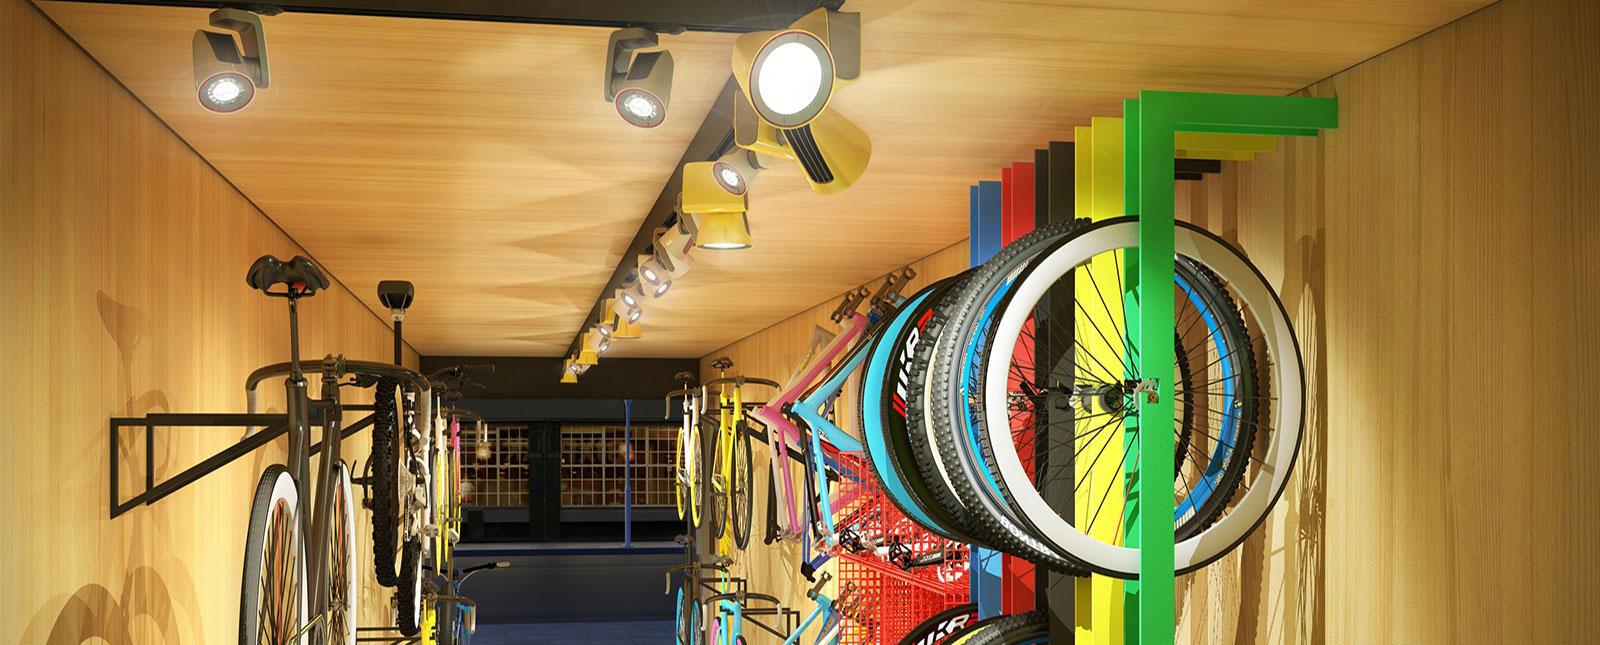 Shopbeleuchtung - Havells Sylvania